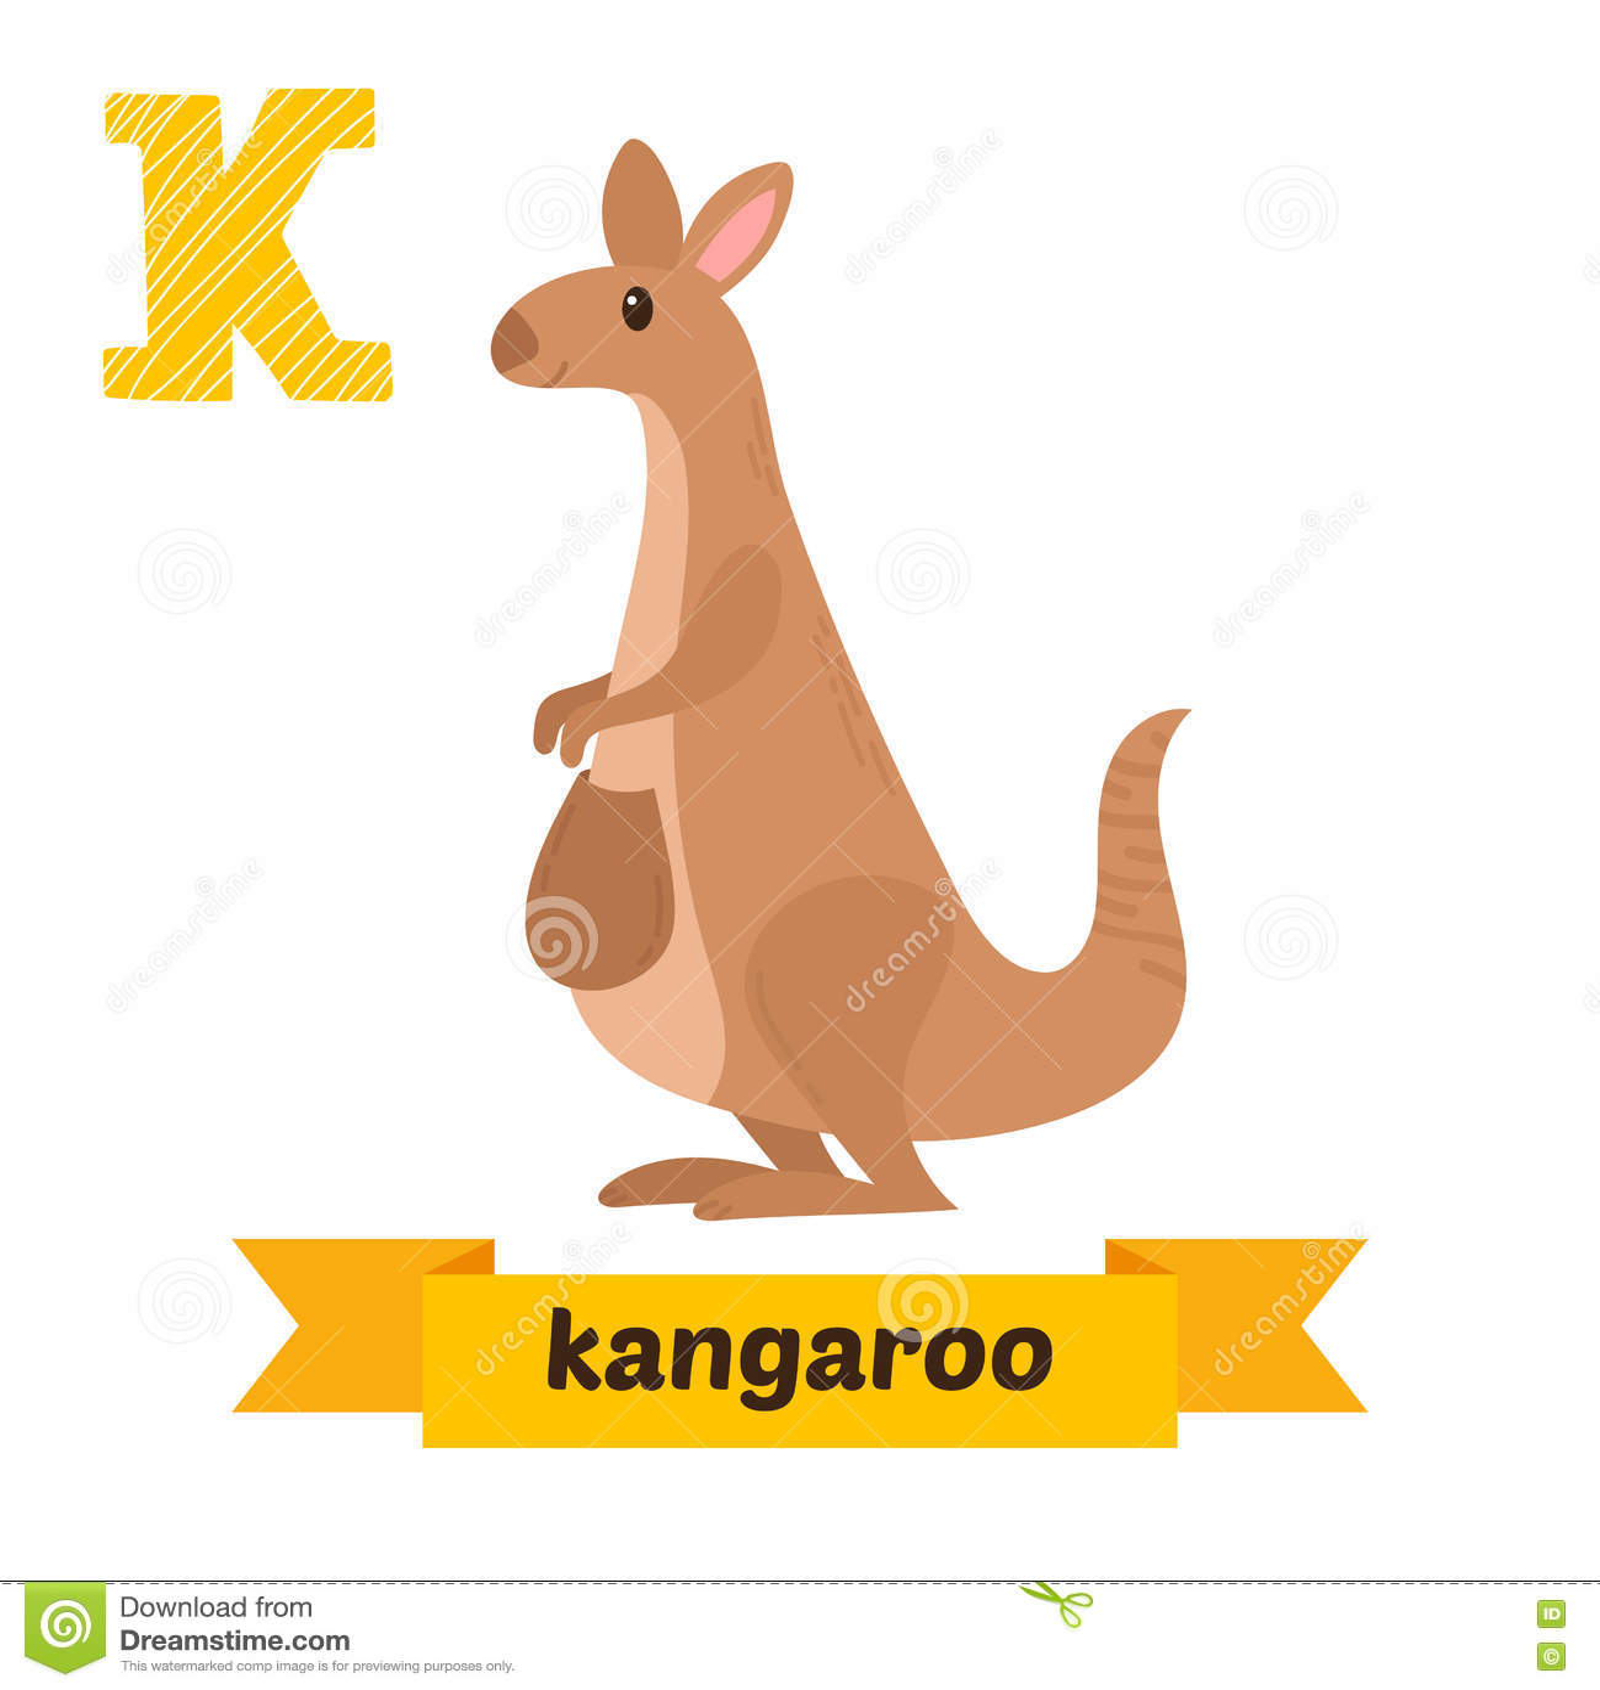 kangaroo k letter cute children animal alphabet in vector fun